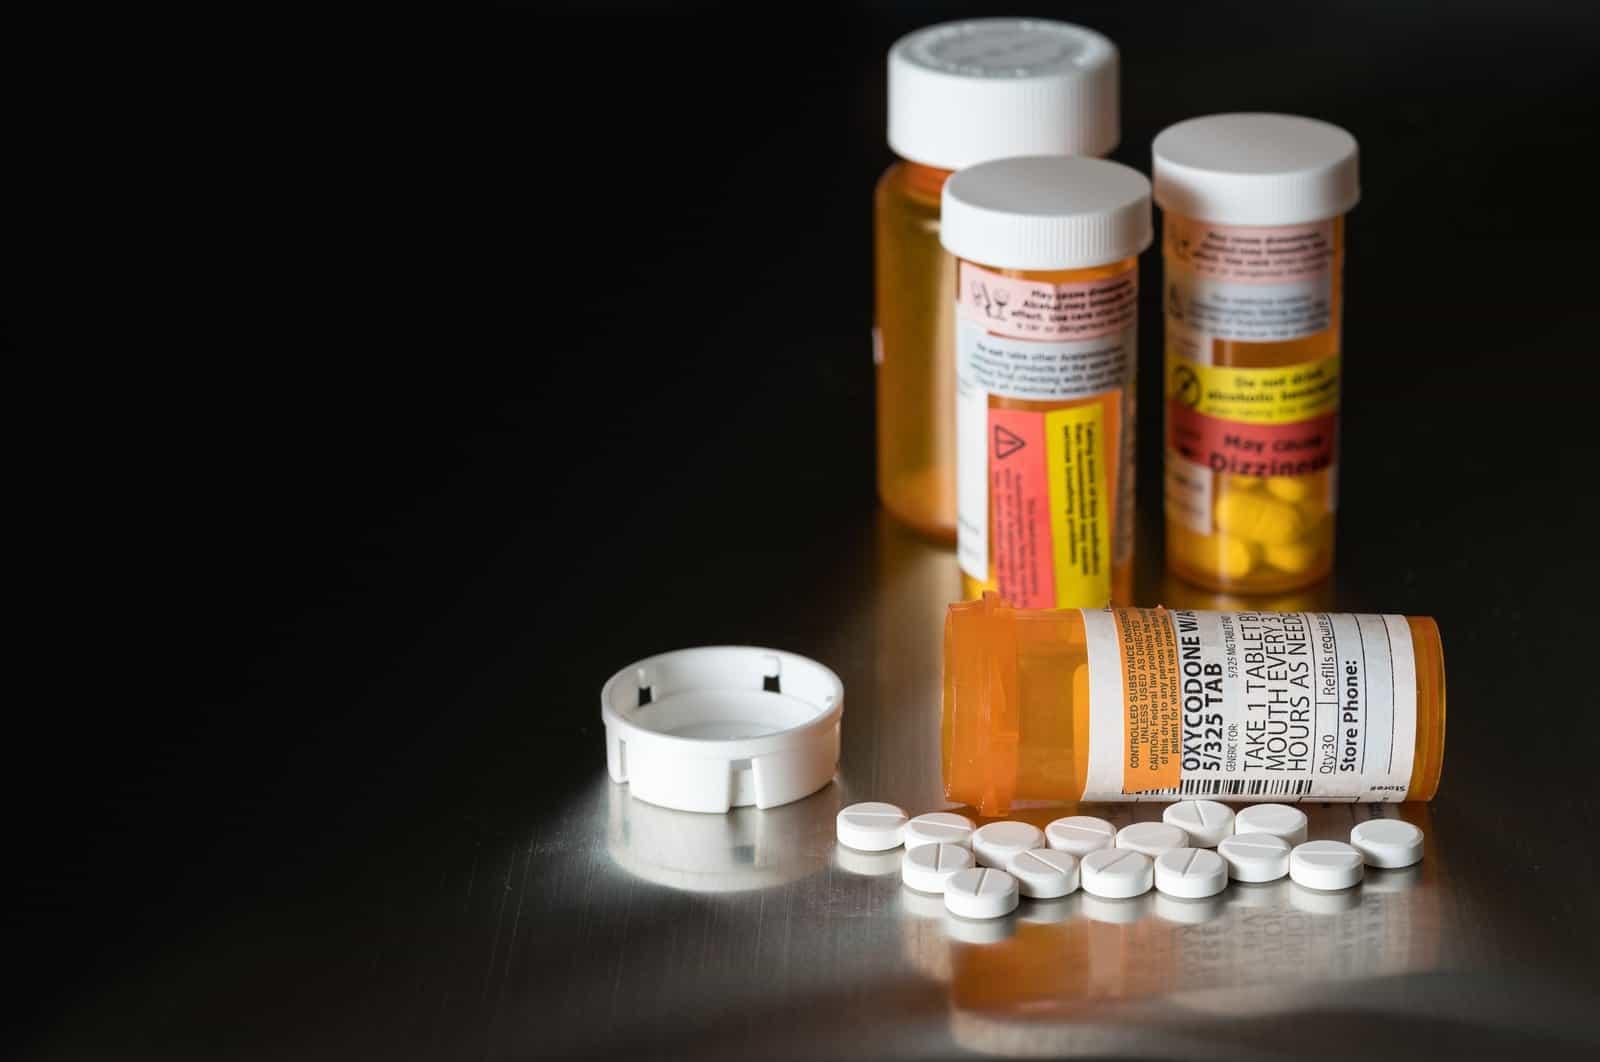 Cannabis Legalization Could Reduce Opioid Deaths